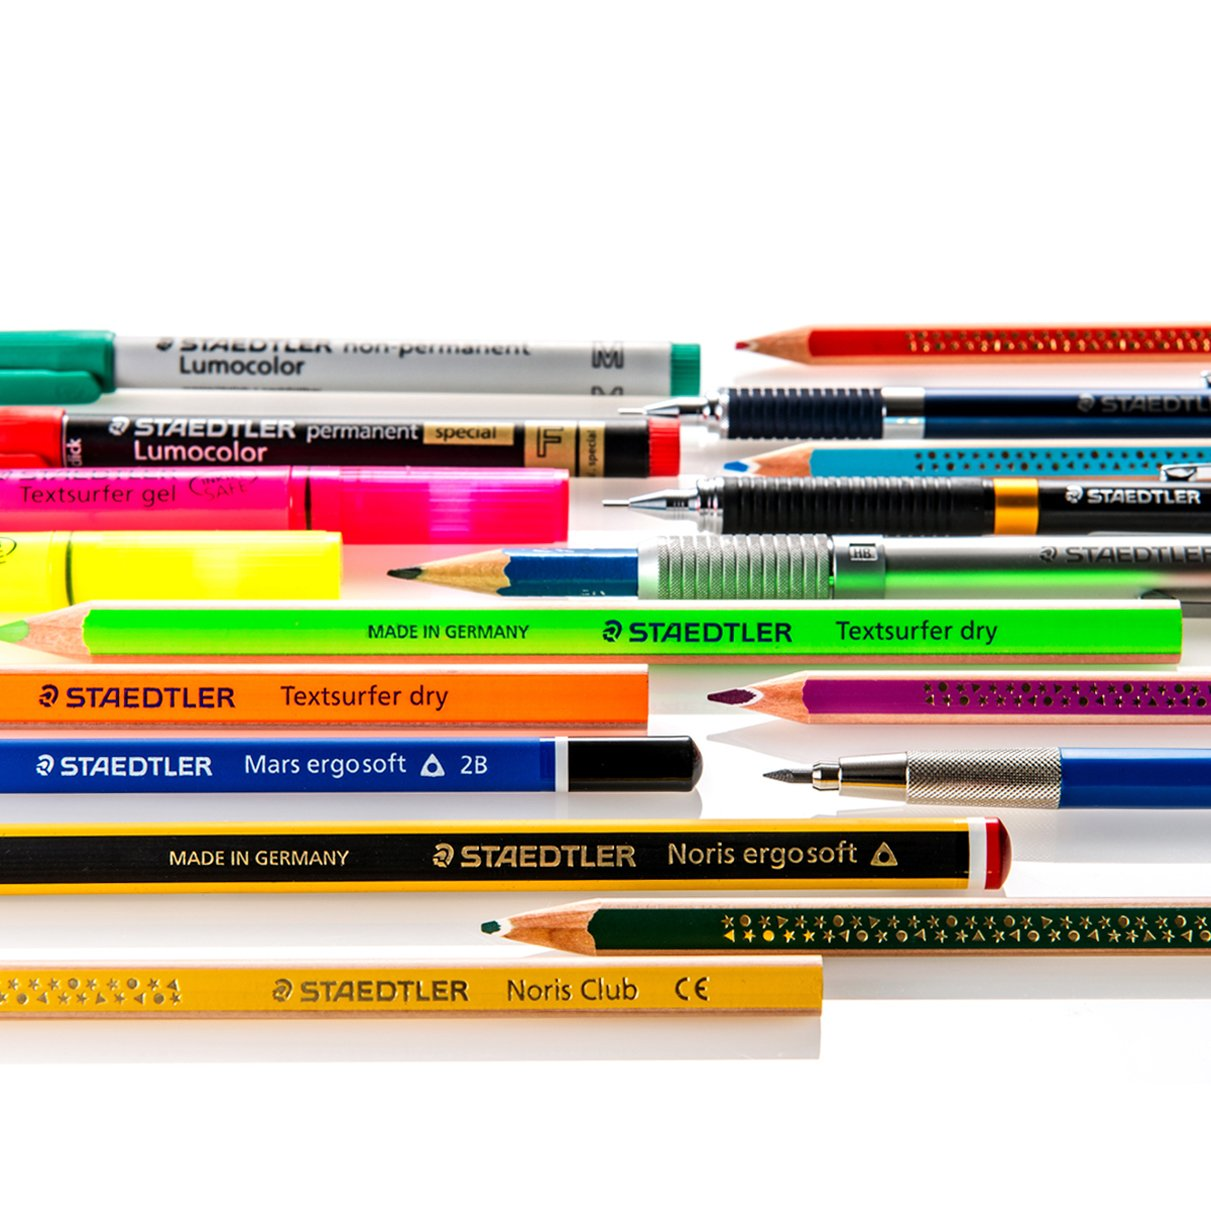 Staedtler Triplus Fineliner Pen - Green by STAEDTLER (Image #8)